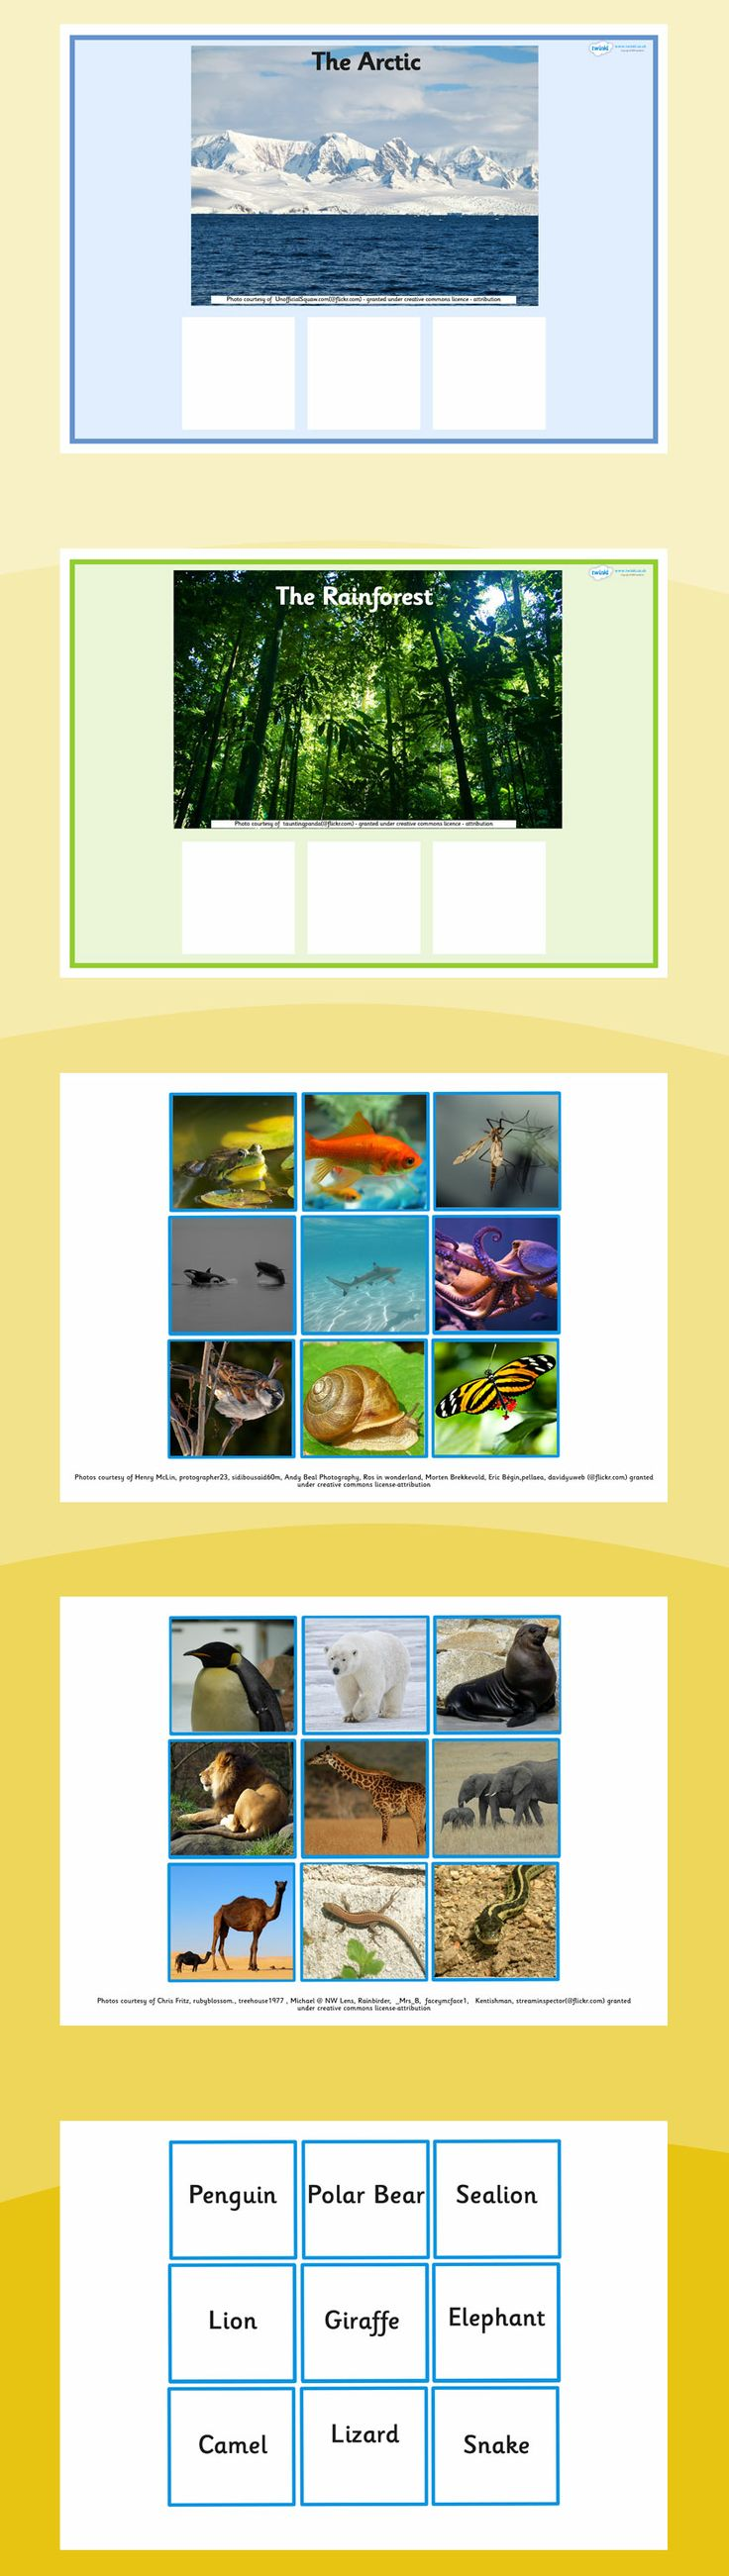 habitats animals habitat matching word card game school is cool pinterest animal habitats. Black Bedroom Furniture Sets. Home Design Ideas